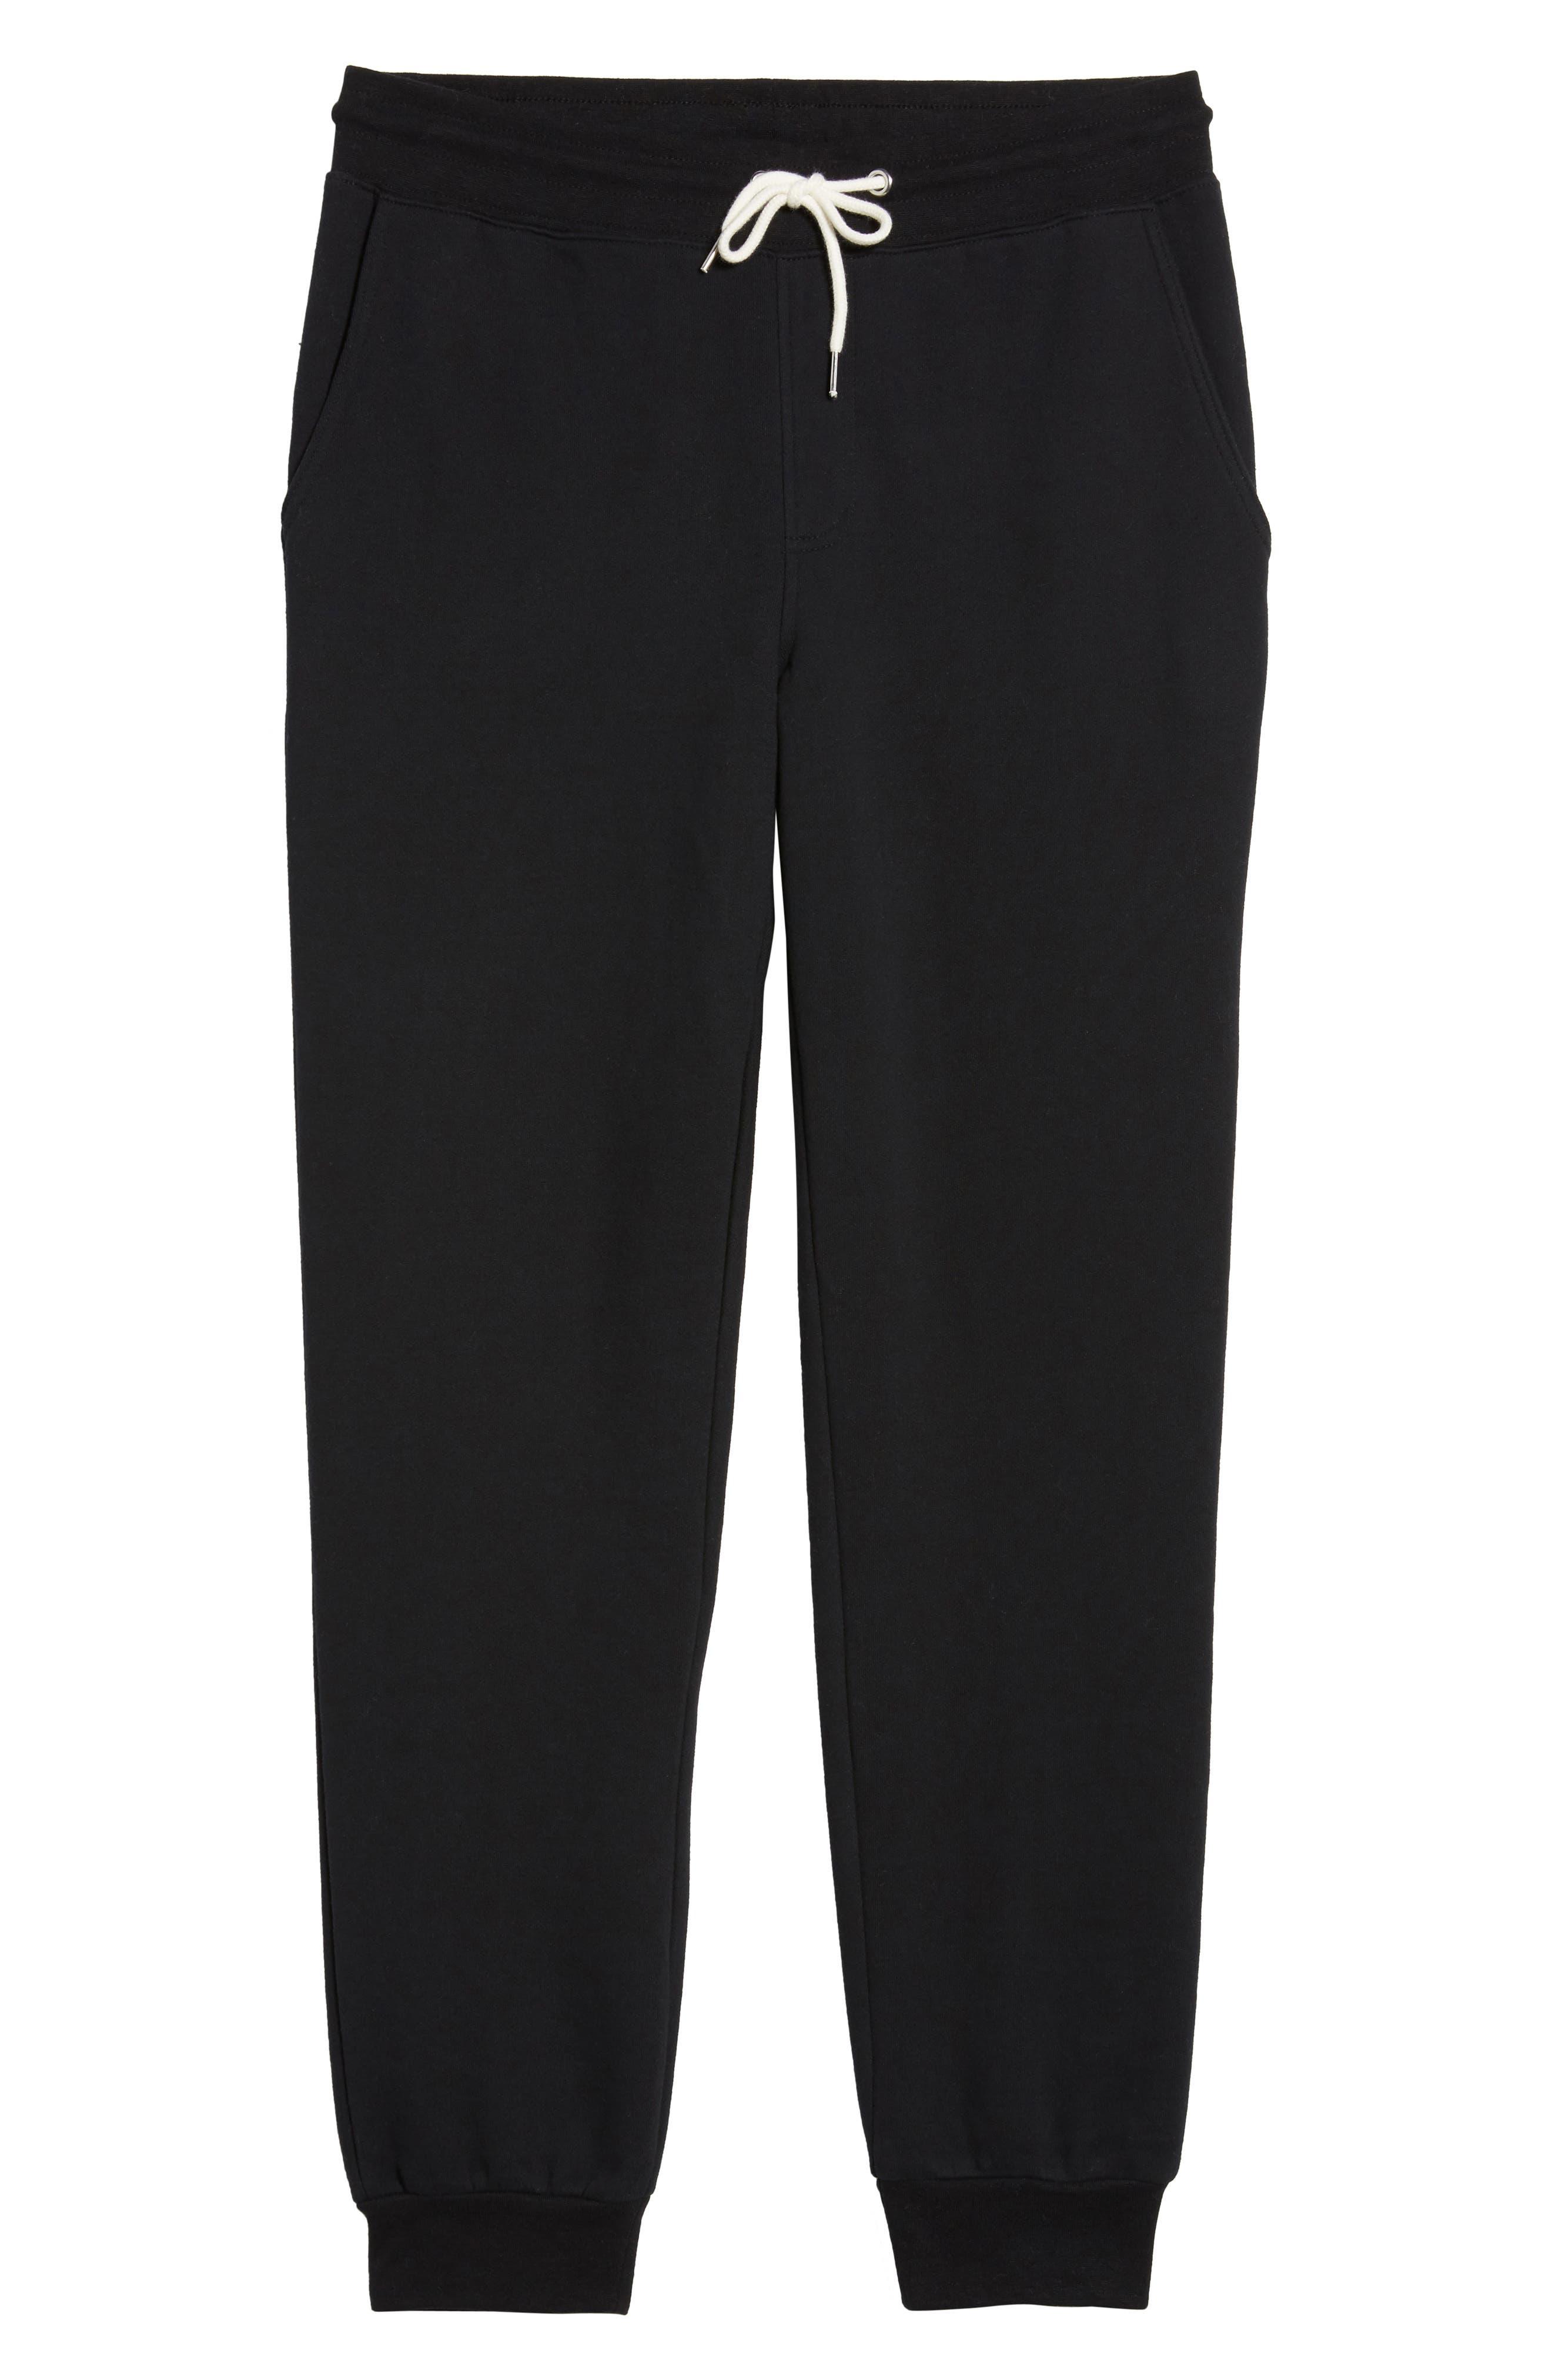 Fleece Jogger Pants,                             Alternate thumbnail 6, color,                             Black Rock